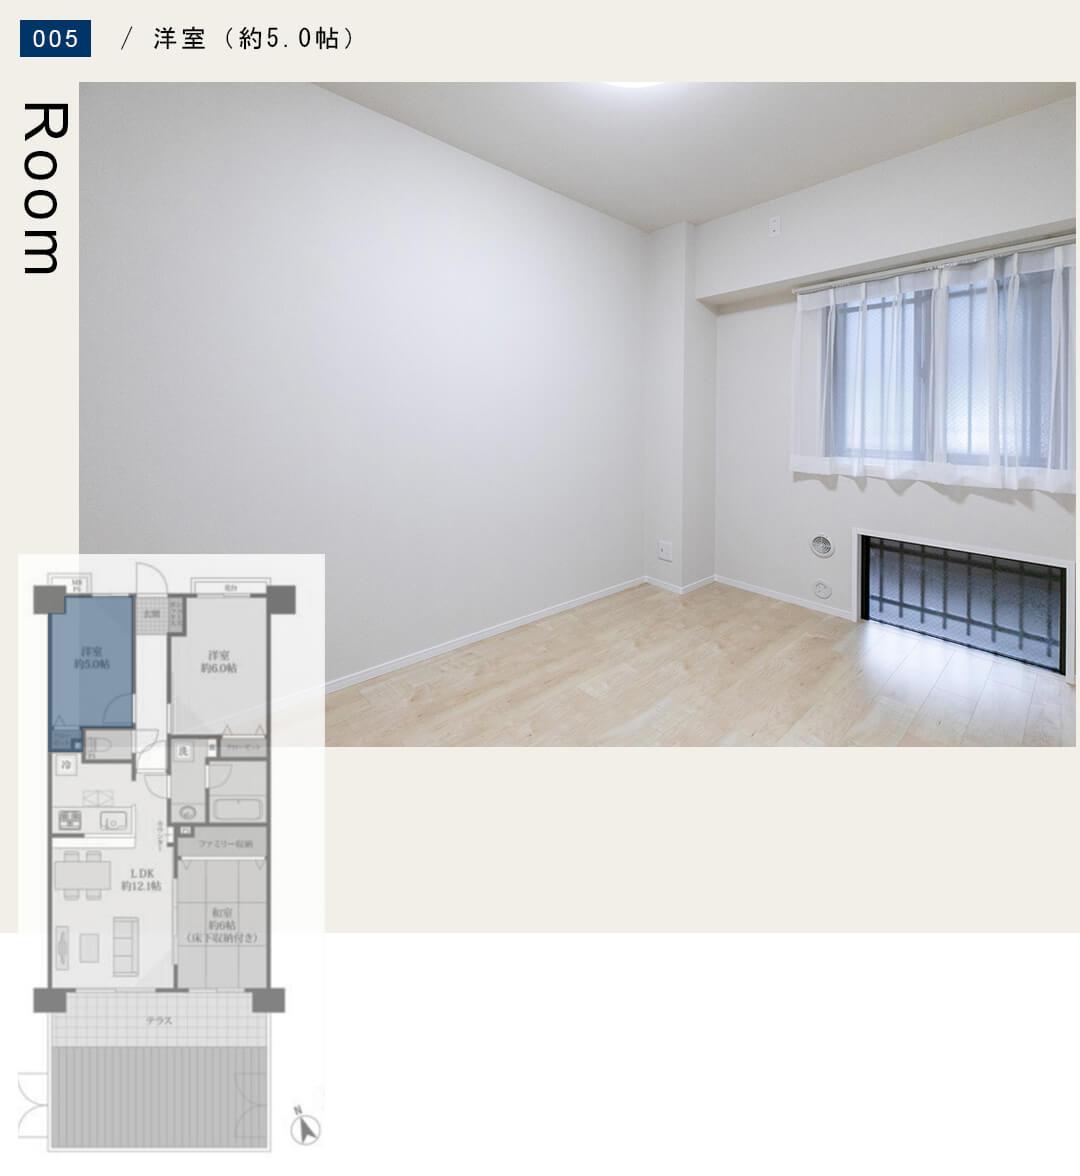 005洋室(約5.0帖),Room